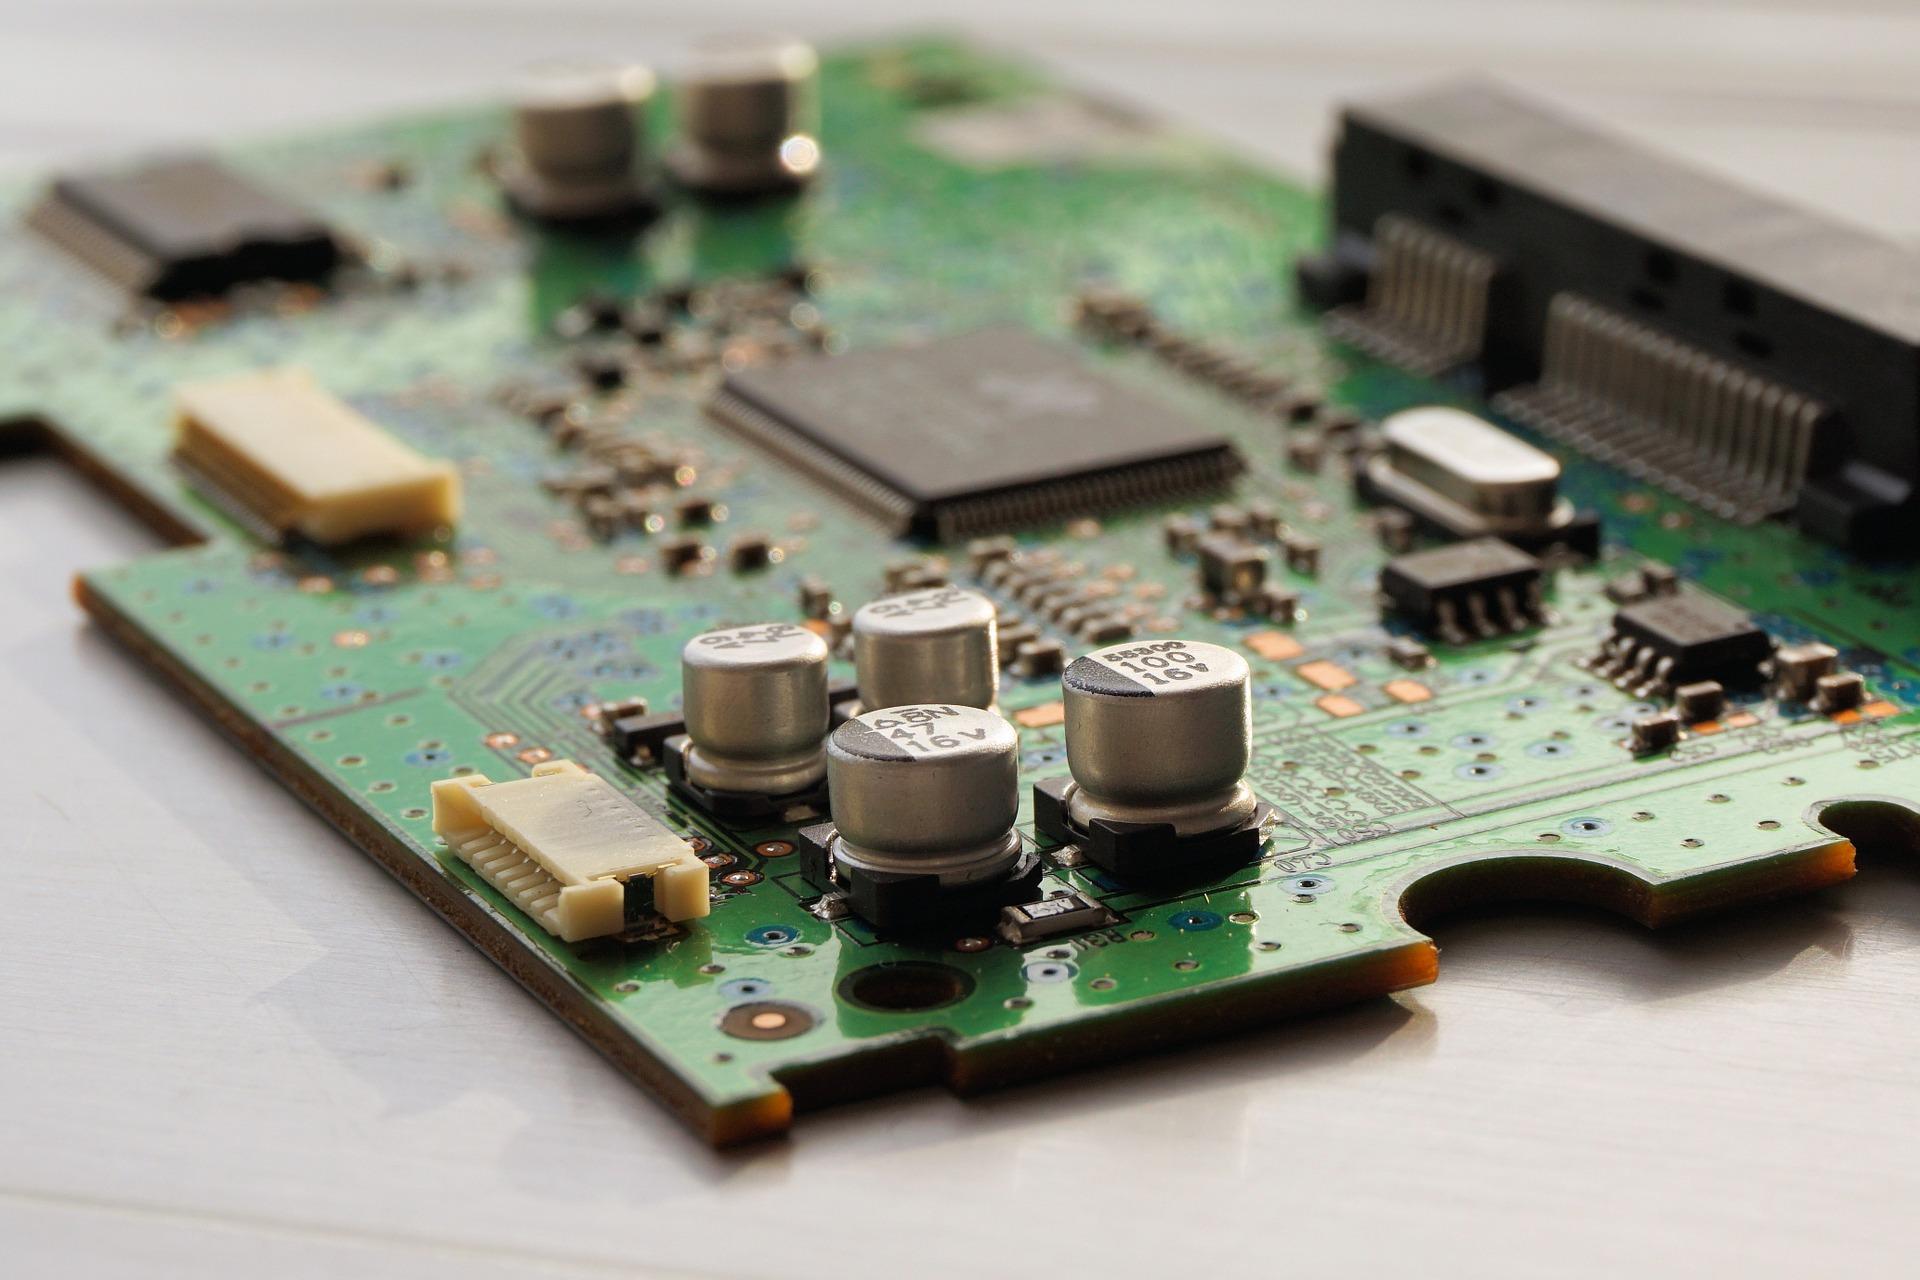 STM32F407 Discovery - Blinky LED (Deep C, Multi SM)